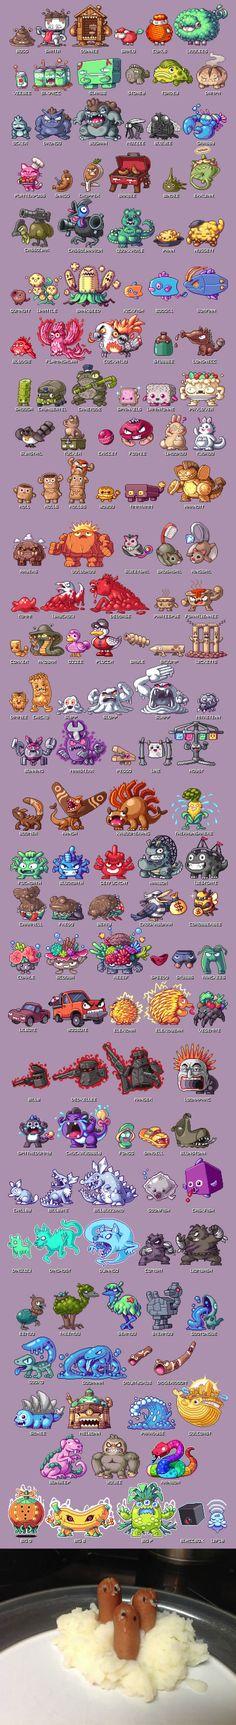 Australian Pokémon Are A National Treasure